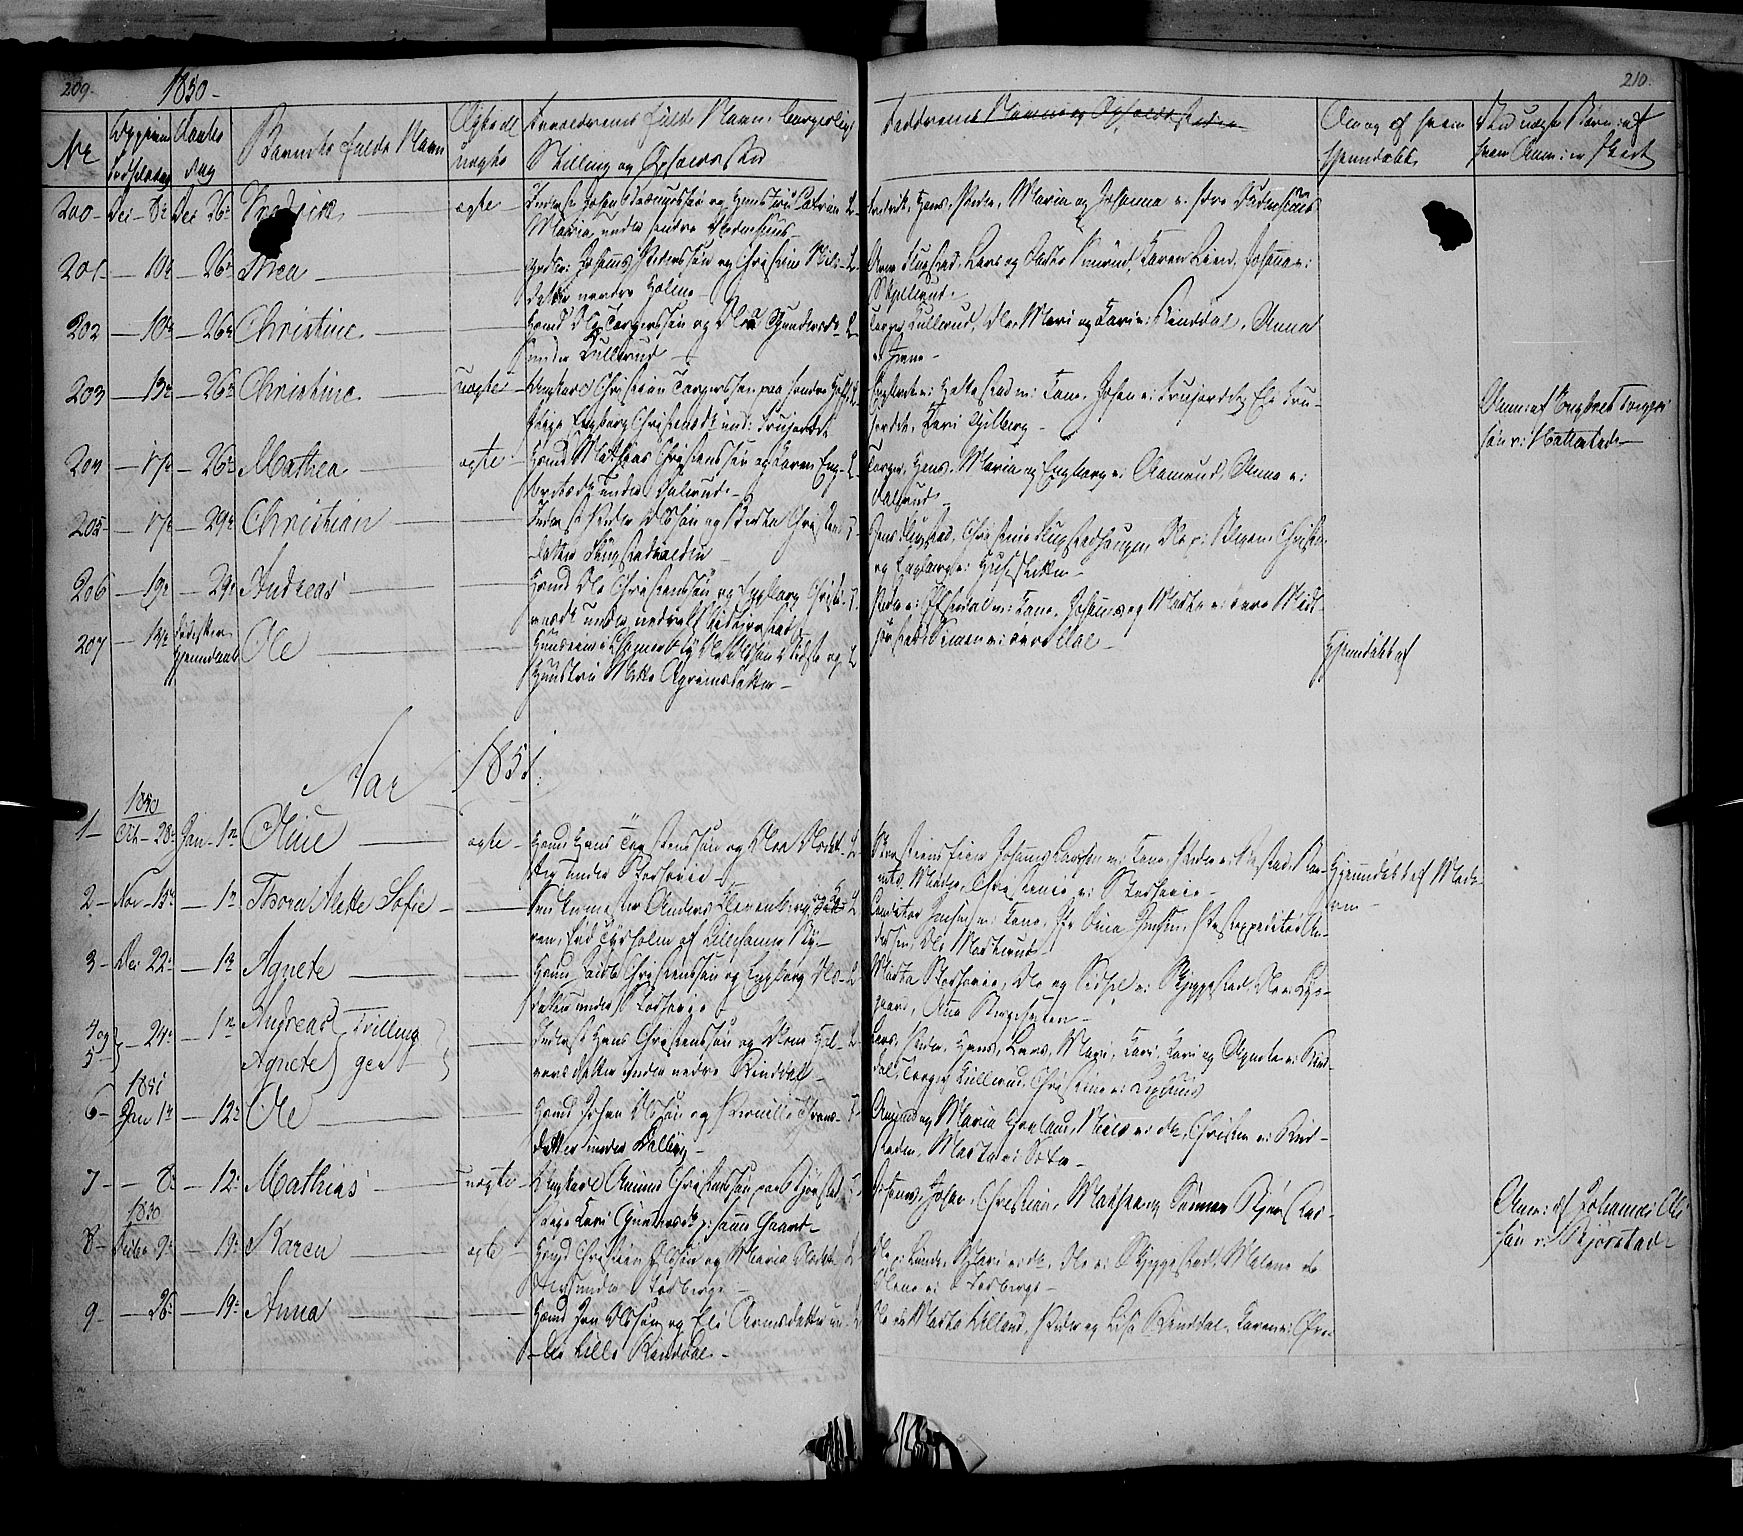 SAH, Fåberg prestekontor, Ministerialbok nr. 5, 1836-1854, s. 209-210